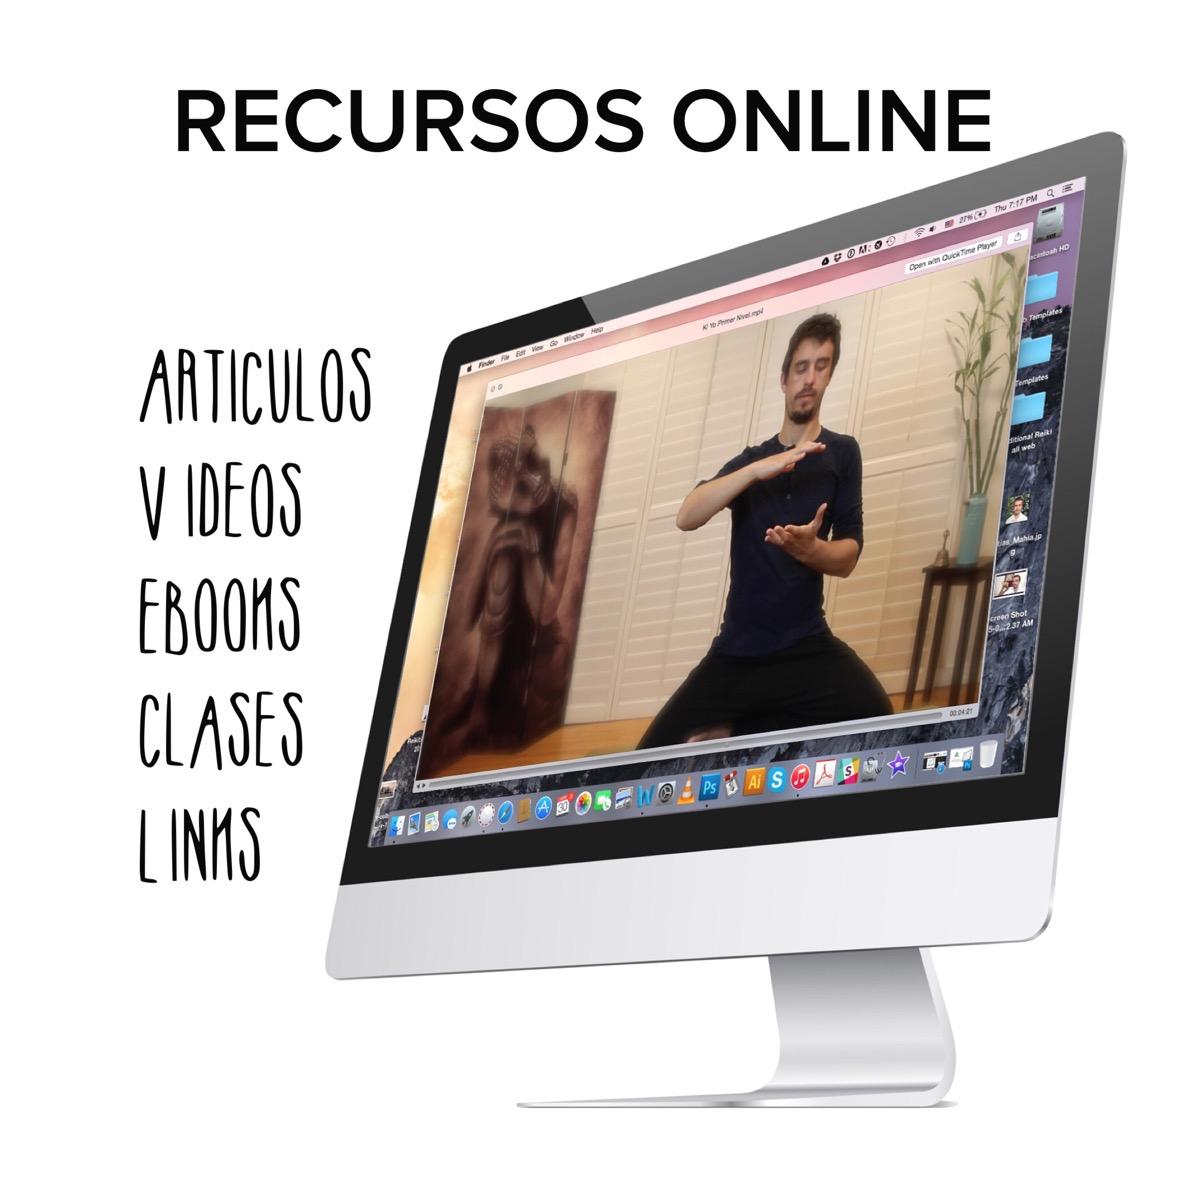 recursos-online